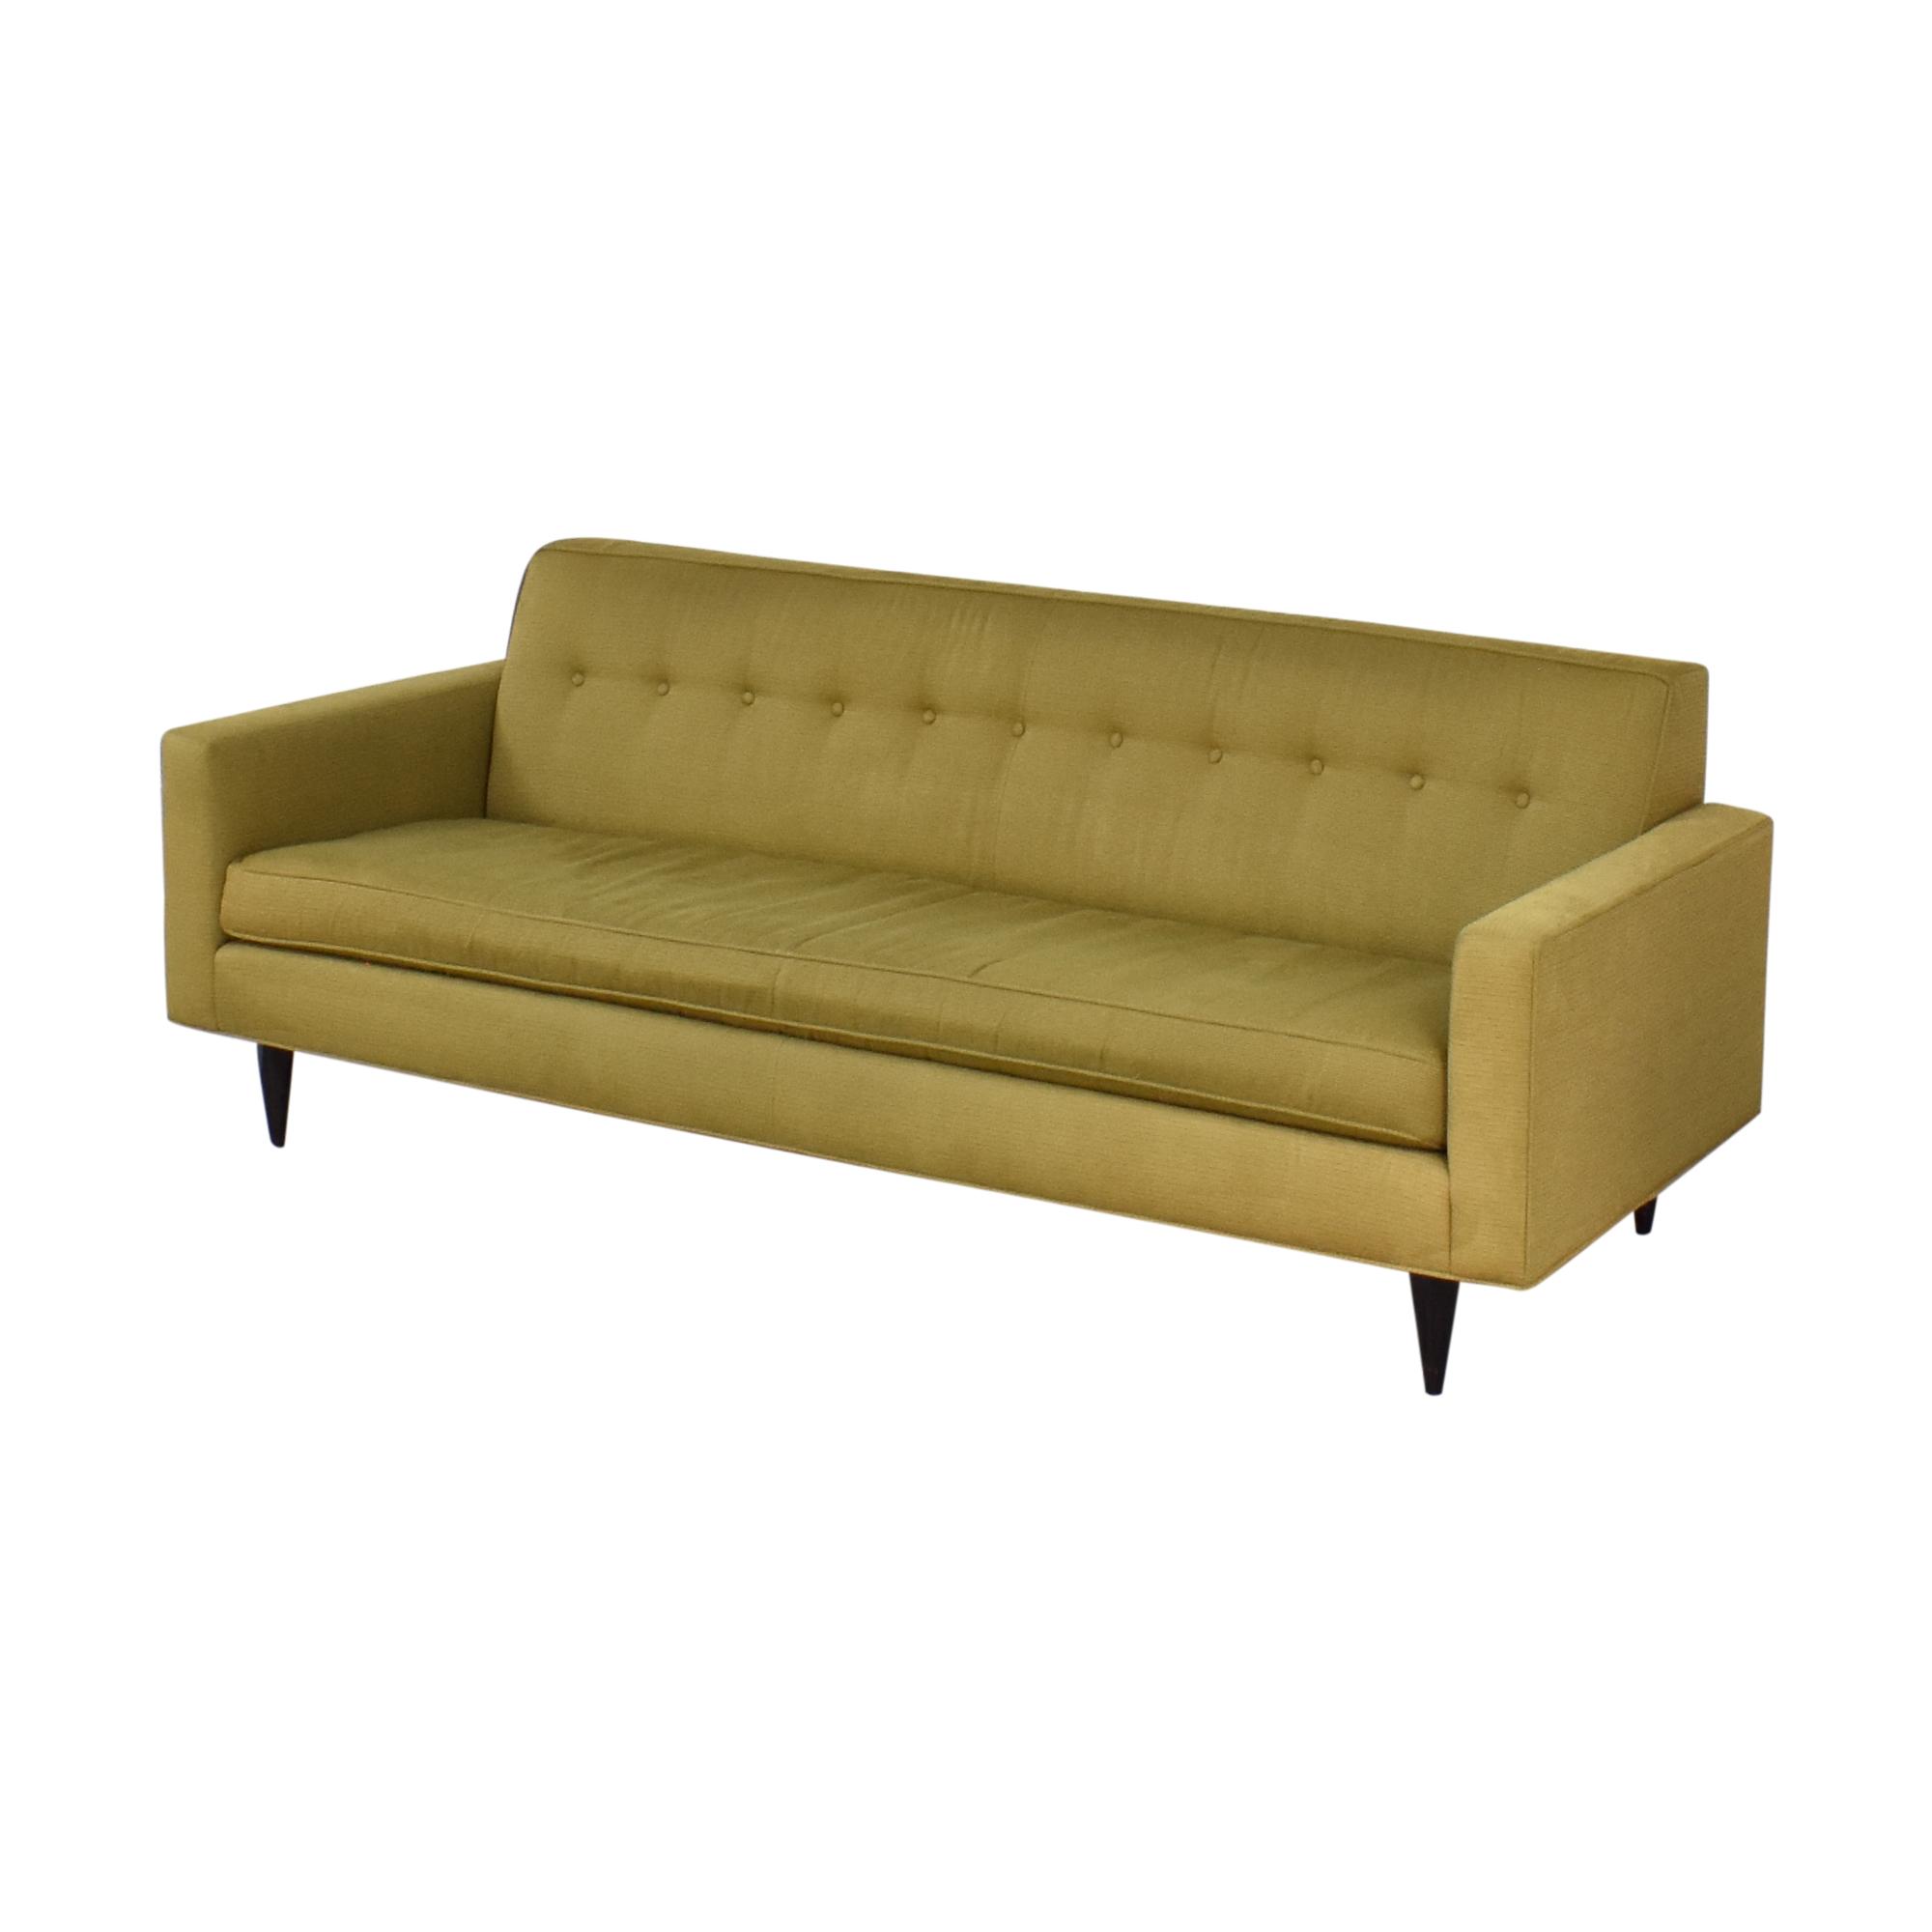 buy Design Within Reach Bantam Tufted Sofa Design Within Reach Classic Sofas